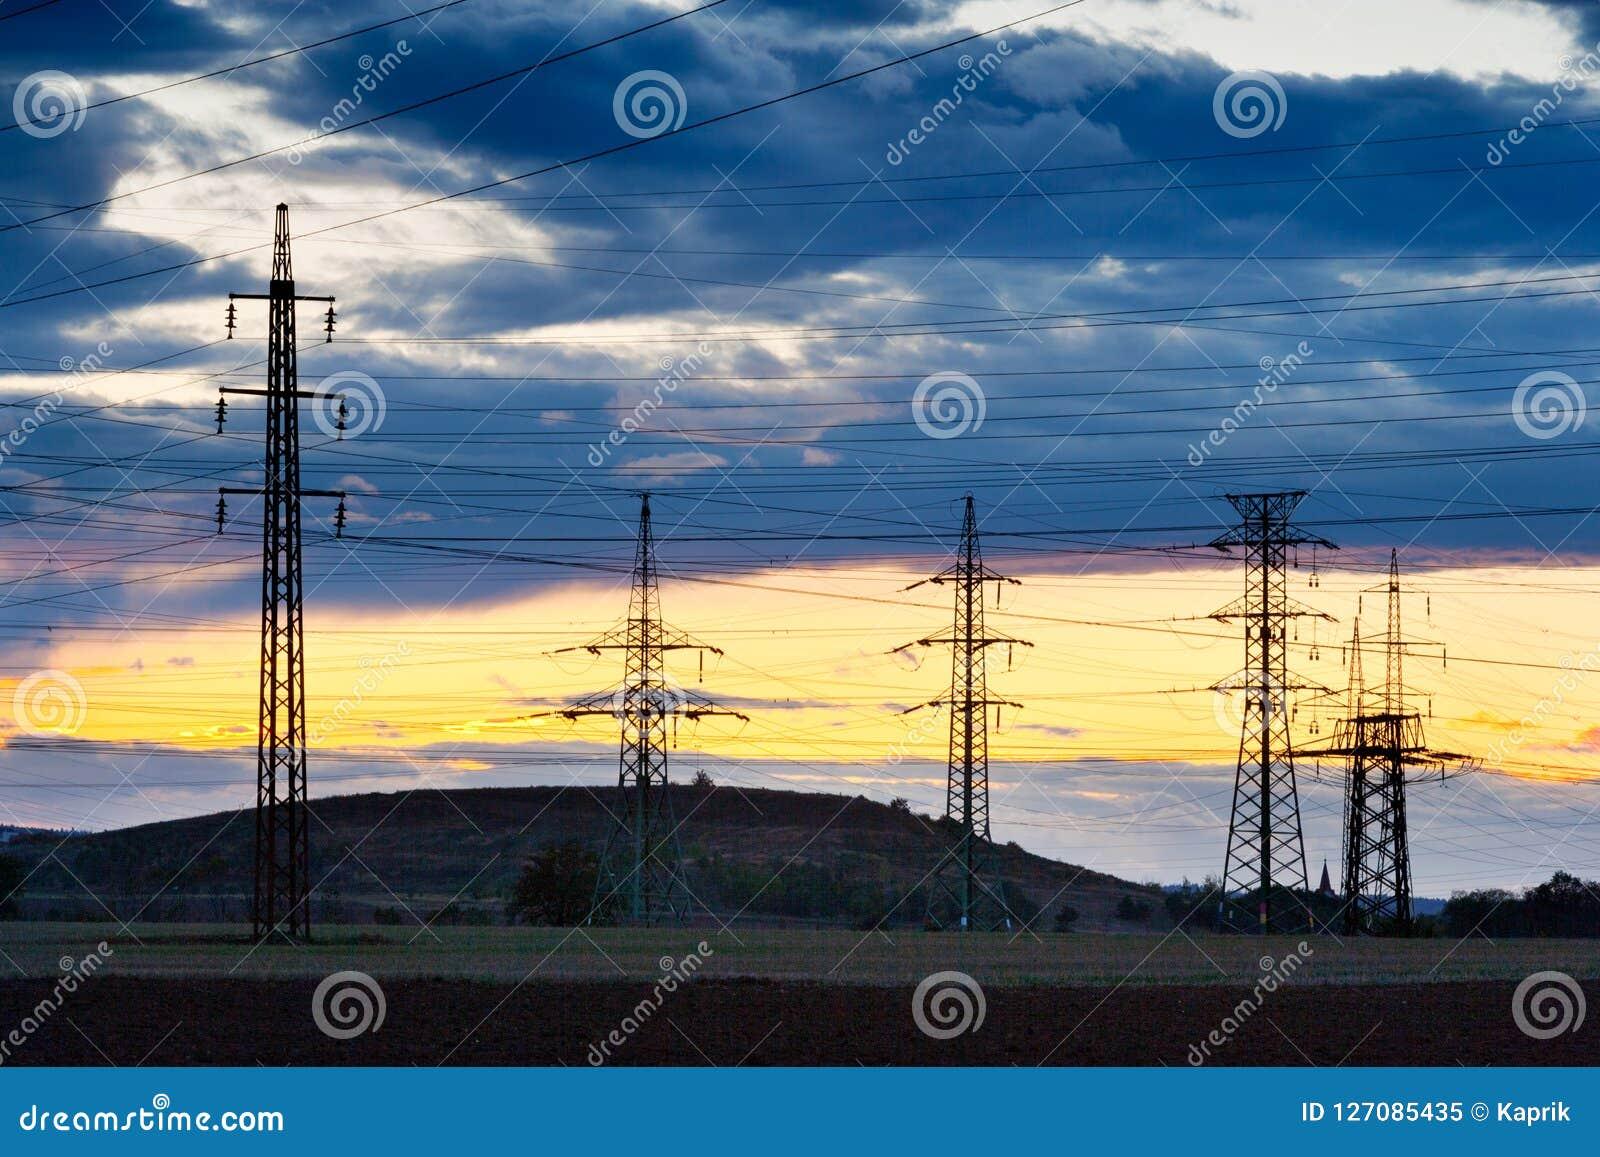 Elettricità - industria energetica di potere - pali elettrici ai soli